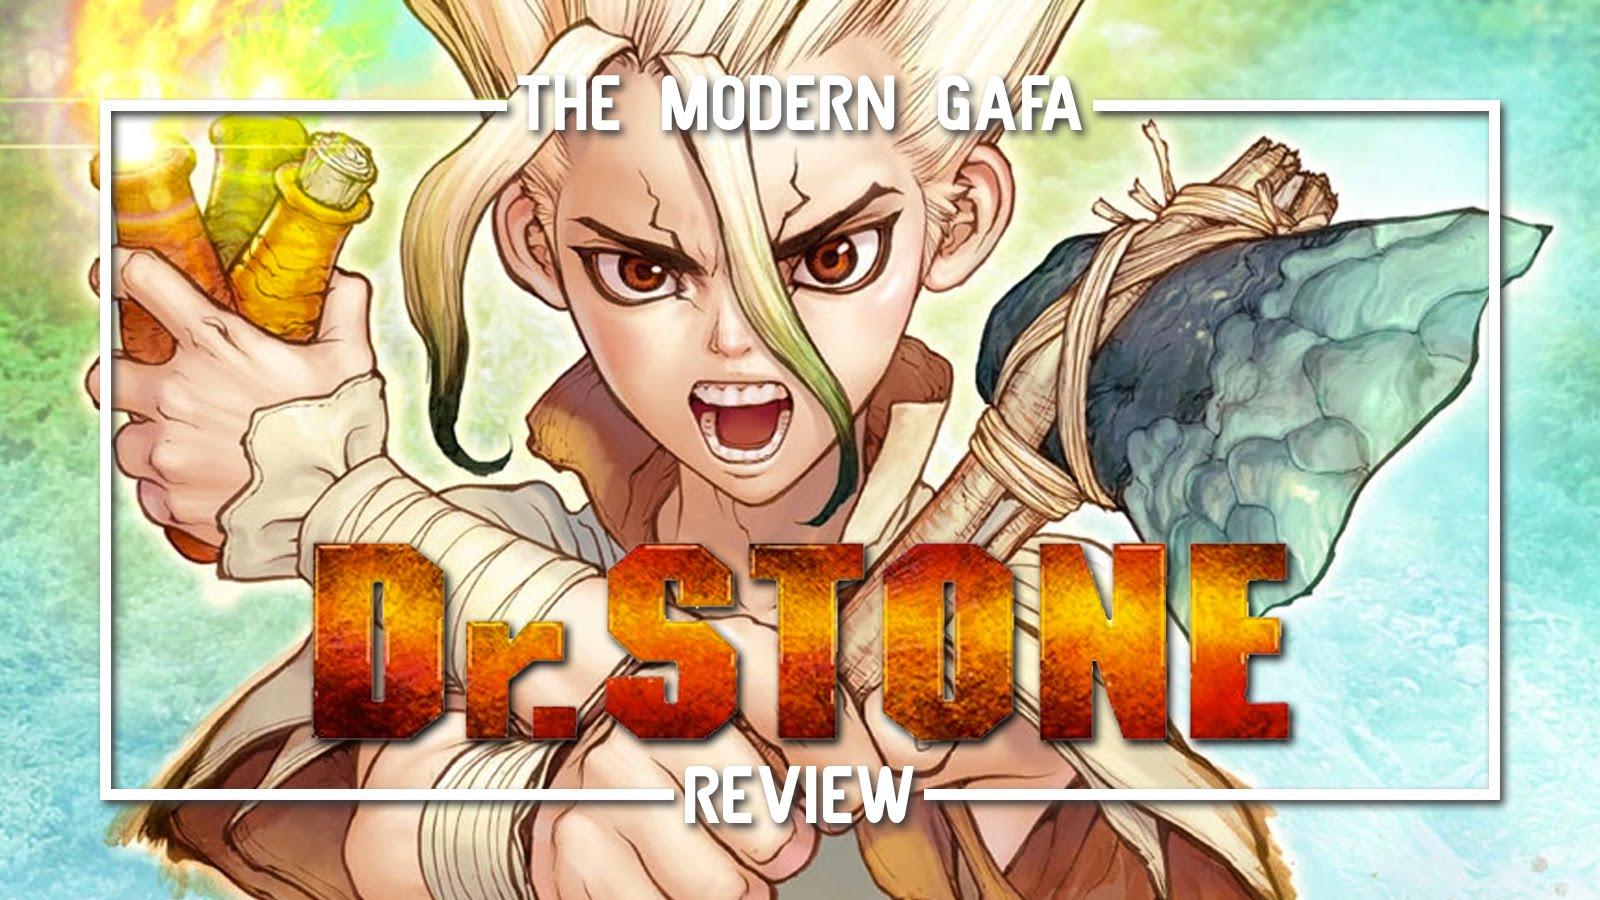 The Modern Gafa Review Dr Stone Vol 1